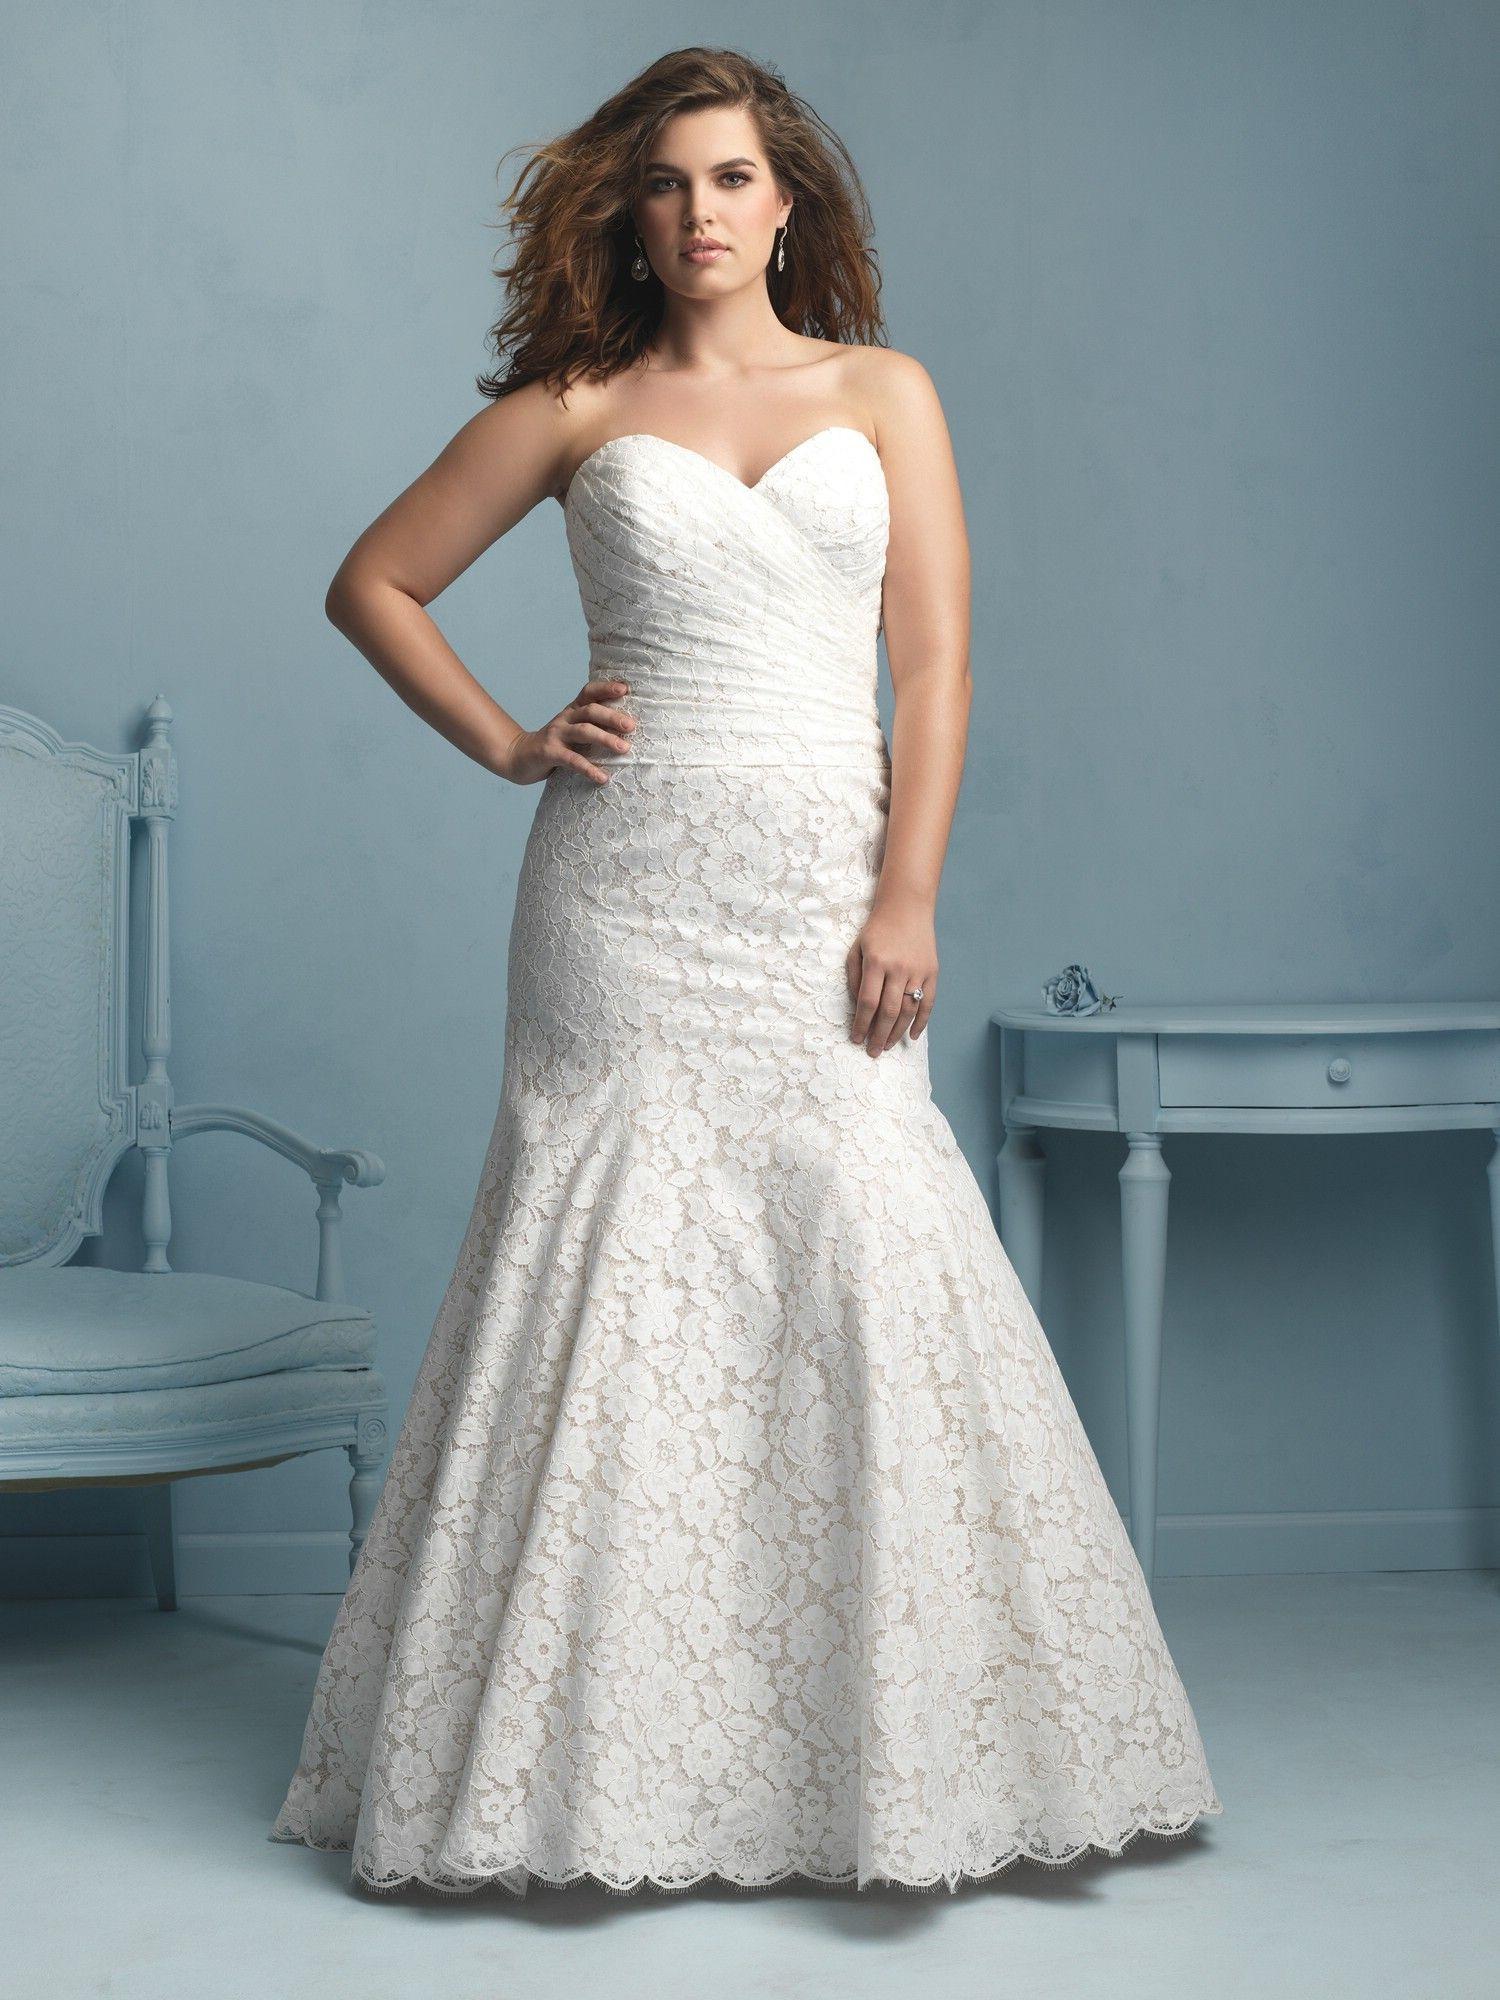 Allure Women Wedding Dresses - Style W354 [W354] : Wedding Dresses ...